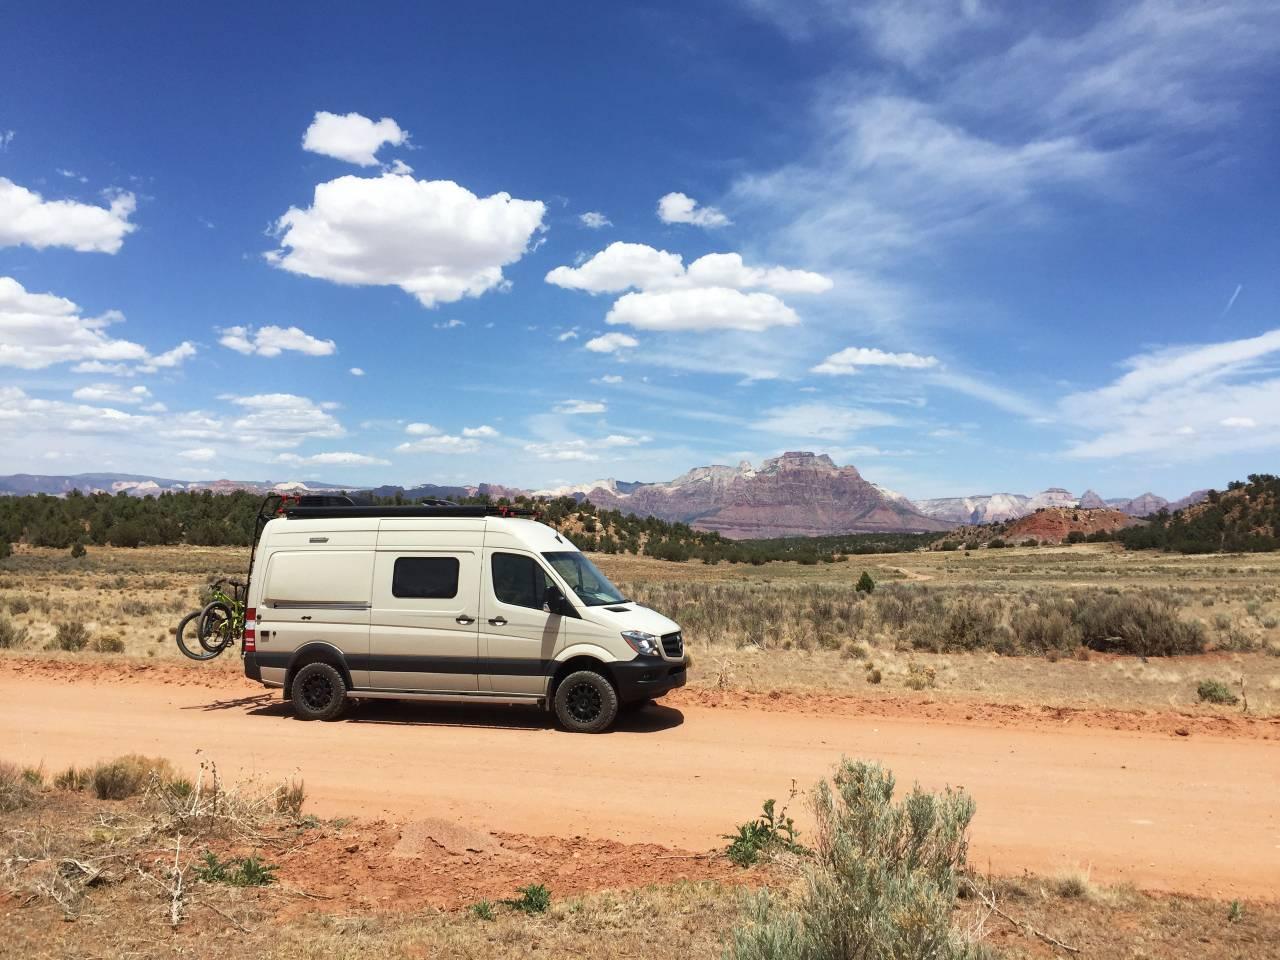 airbnb-bend-oregon-camper-van